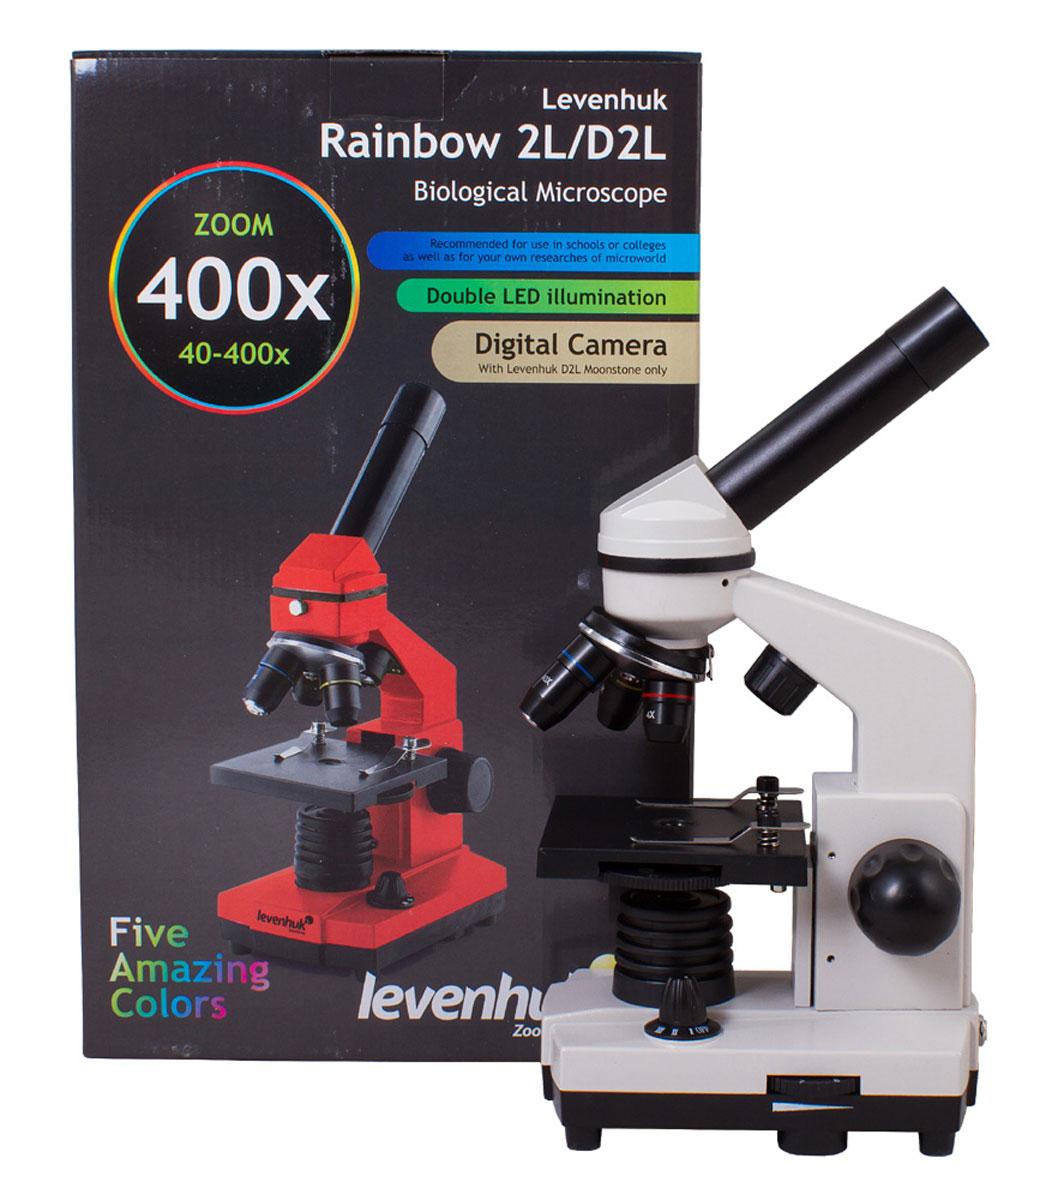 Levenhuk Rainbow 2L, Moonstoneмикроскоп Levenhuk